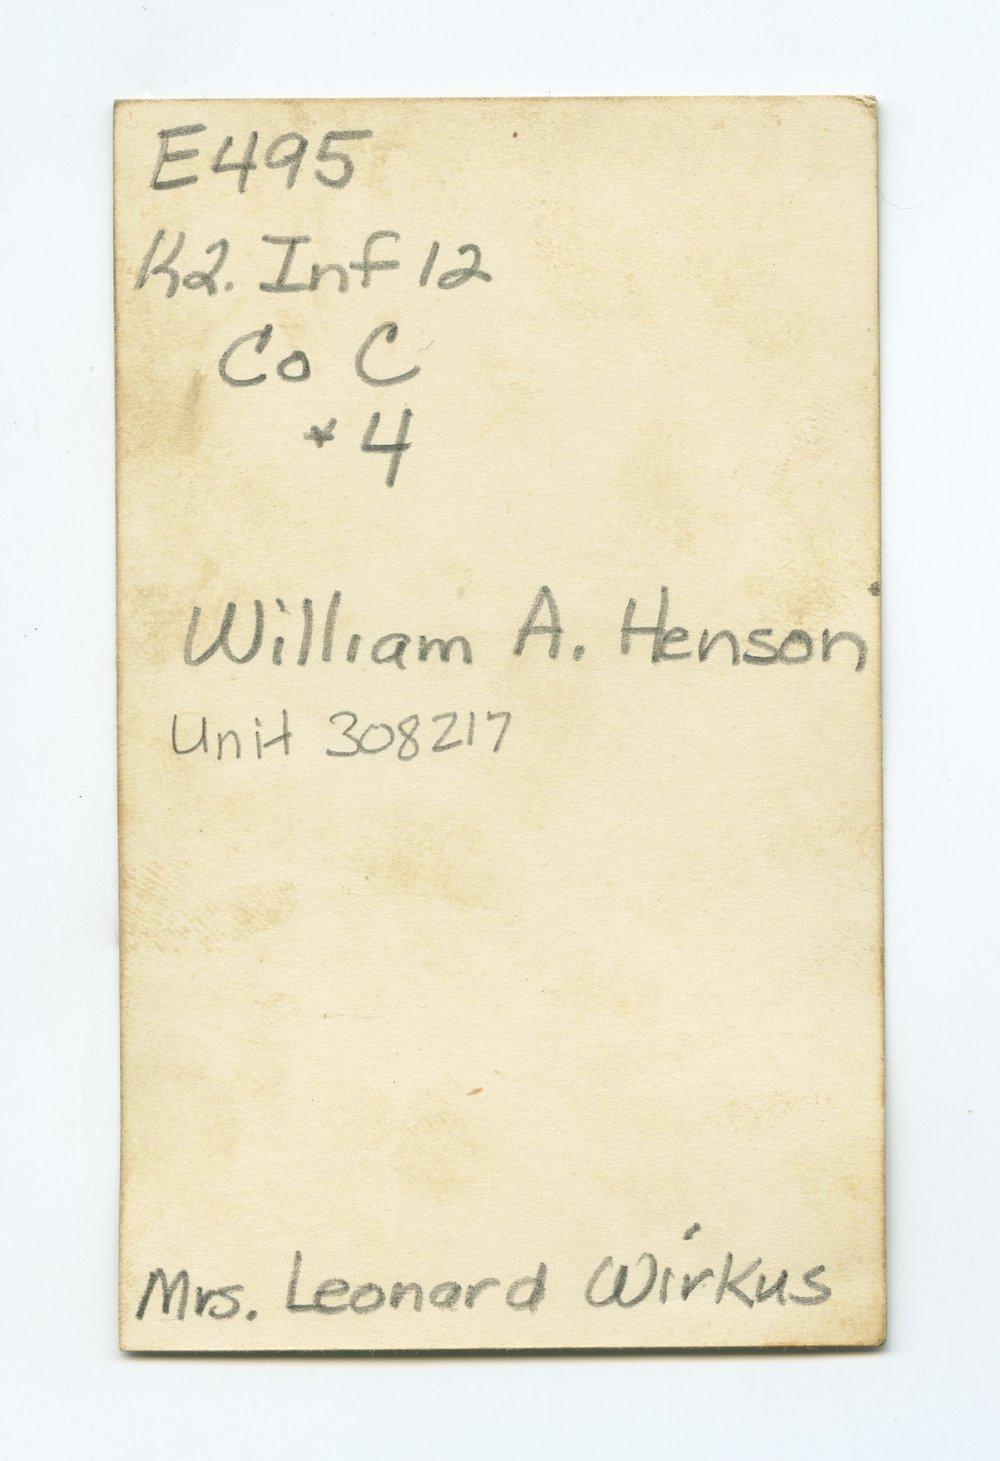 William A. Henson - 2